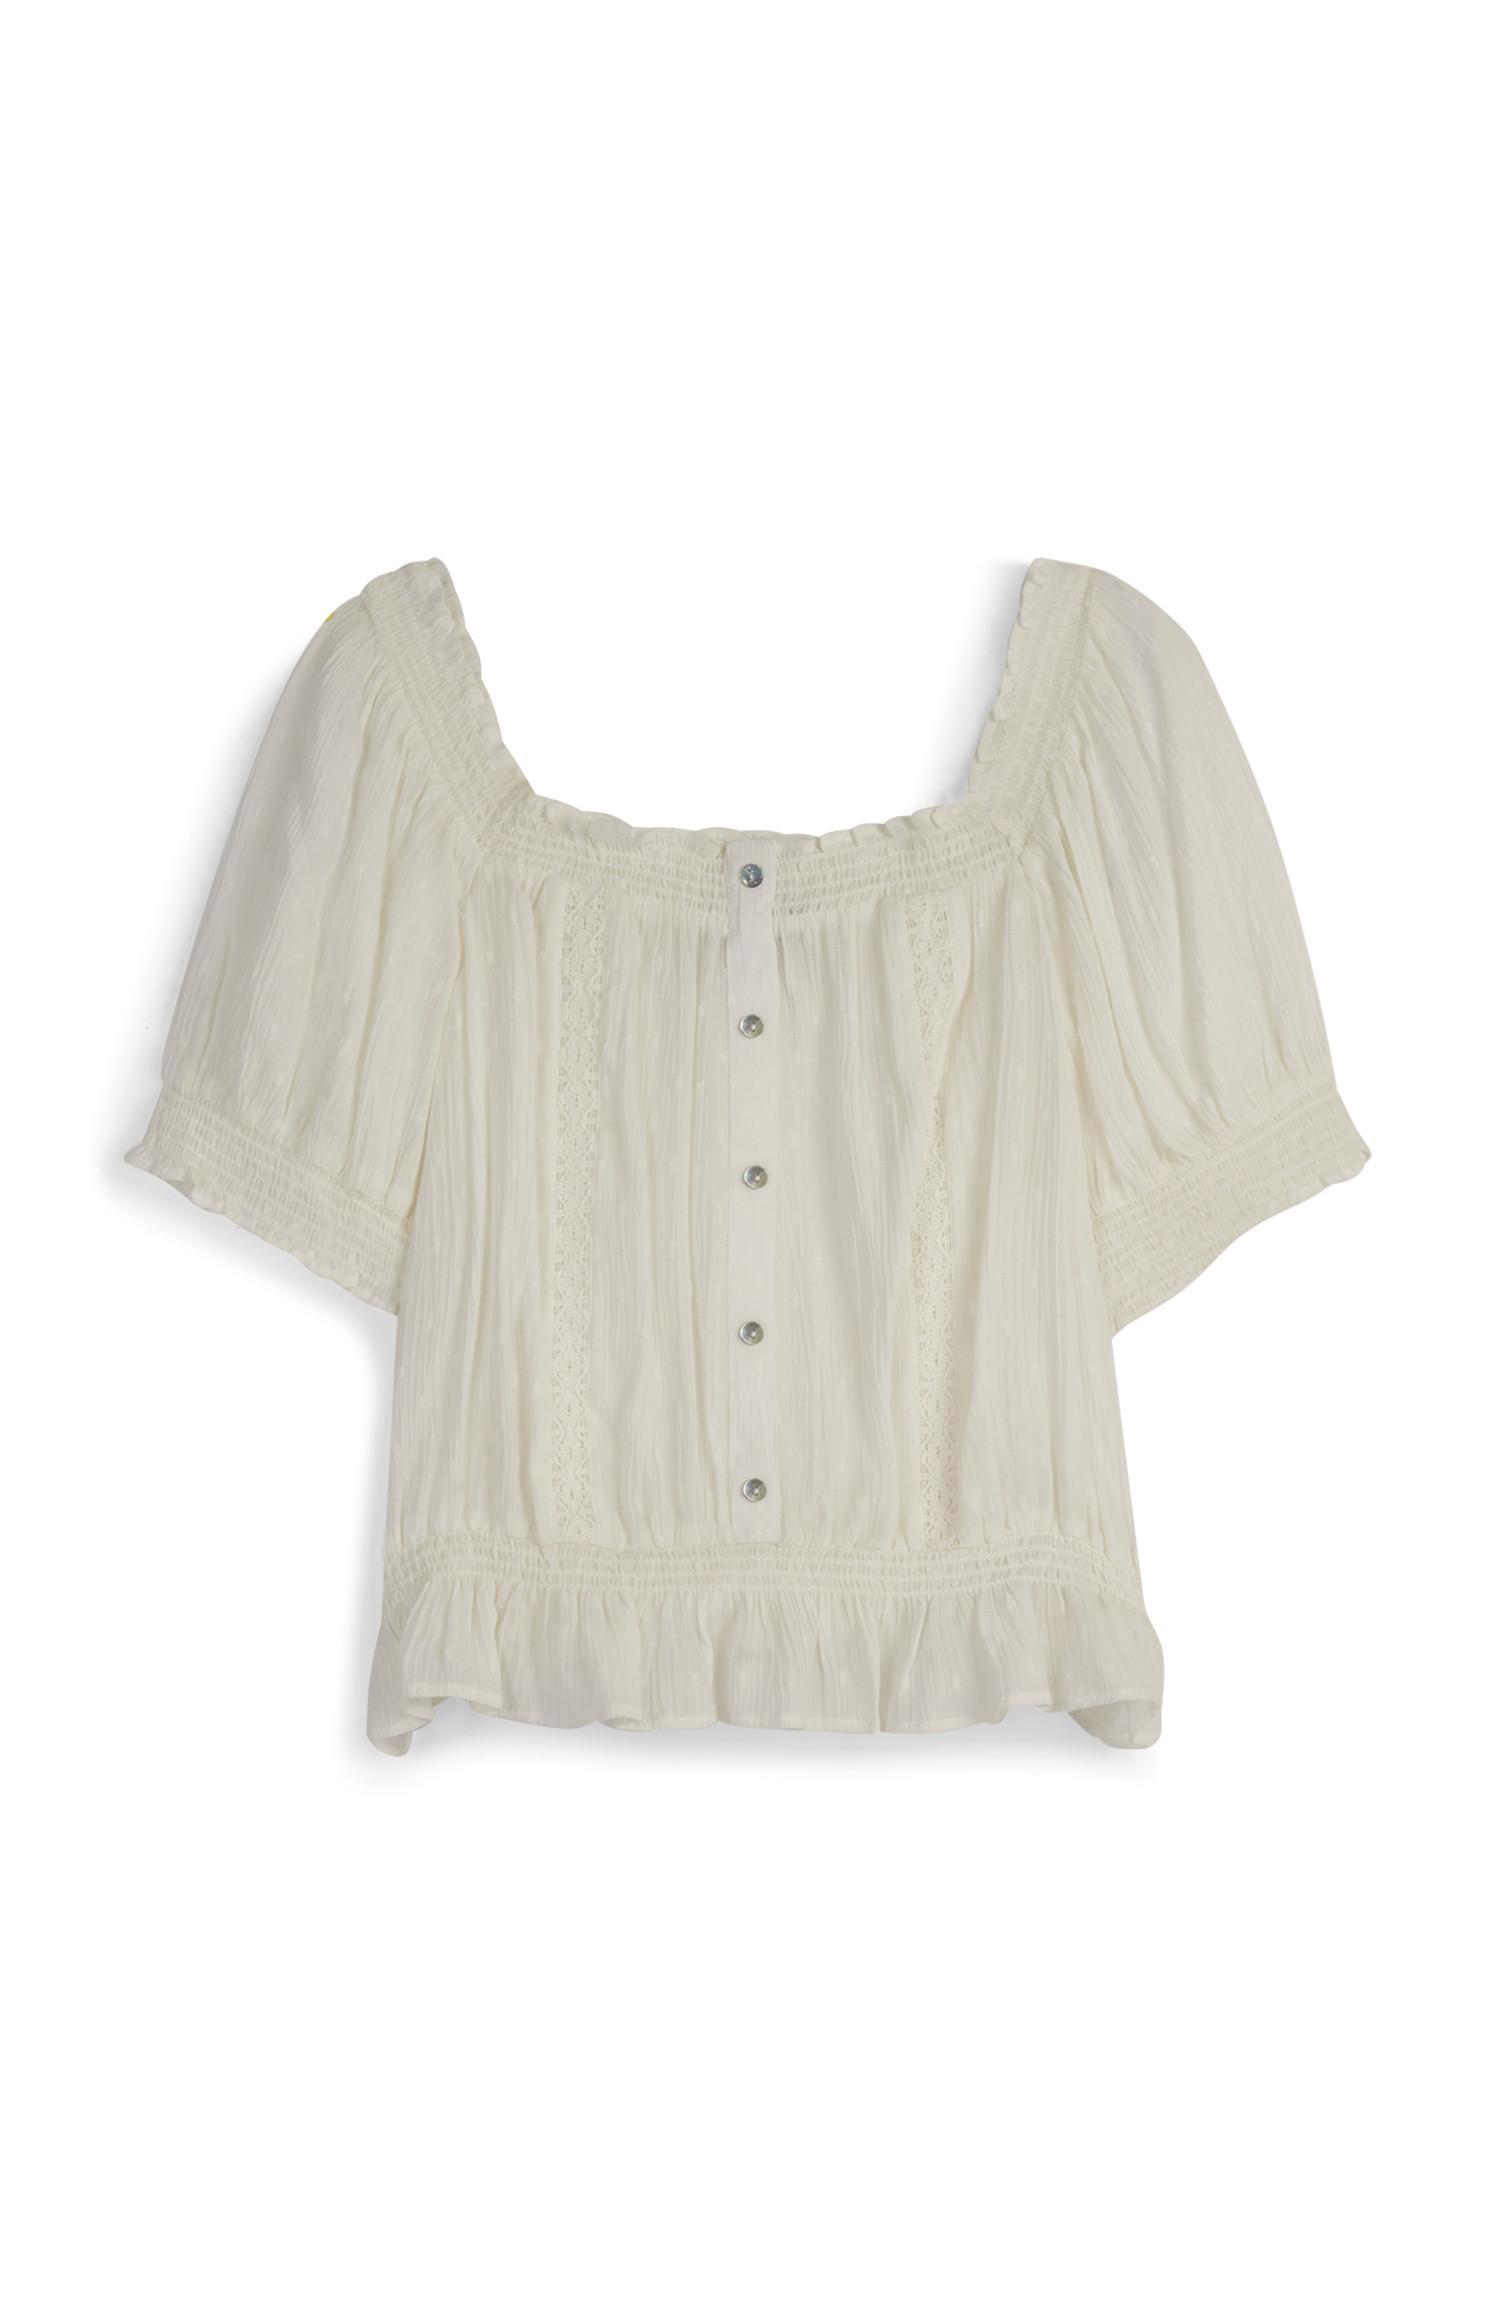 Blusa croché marfim